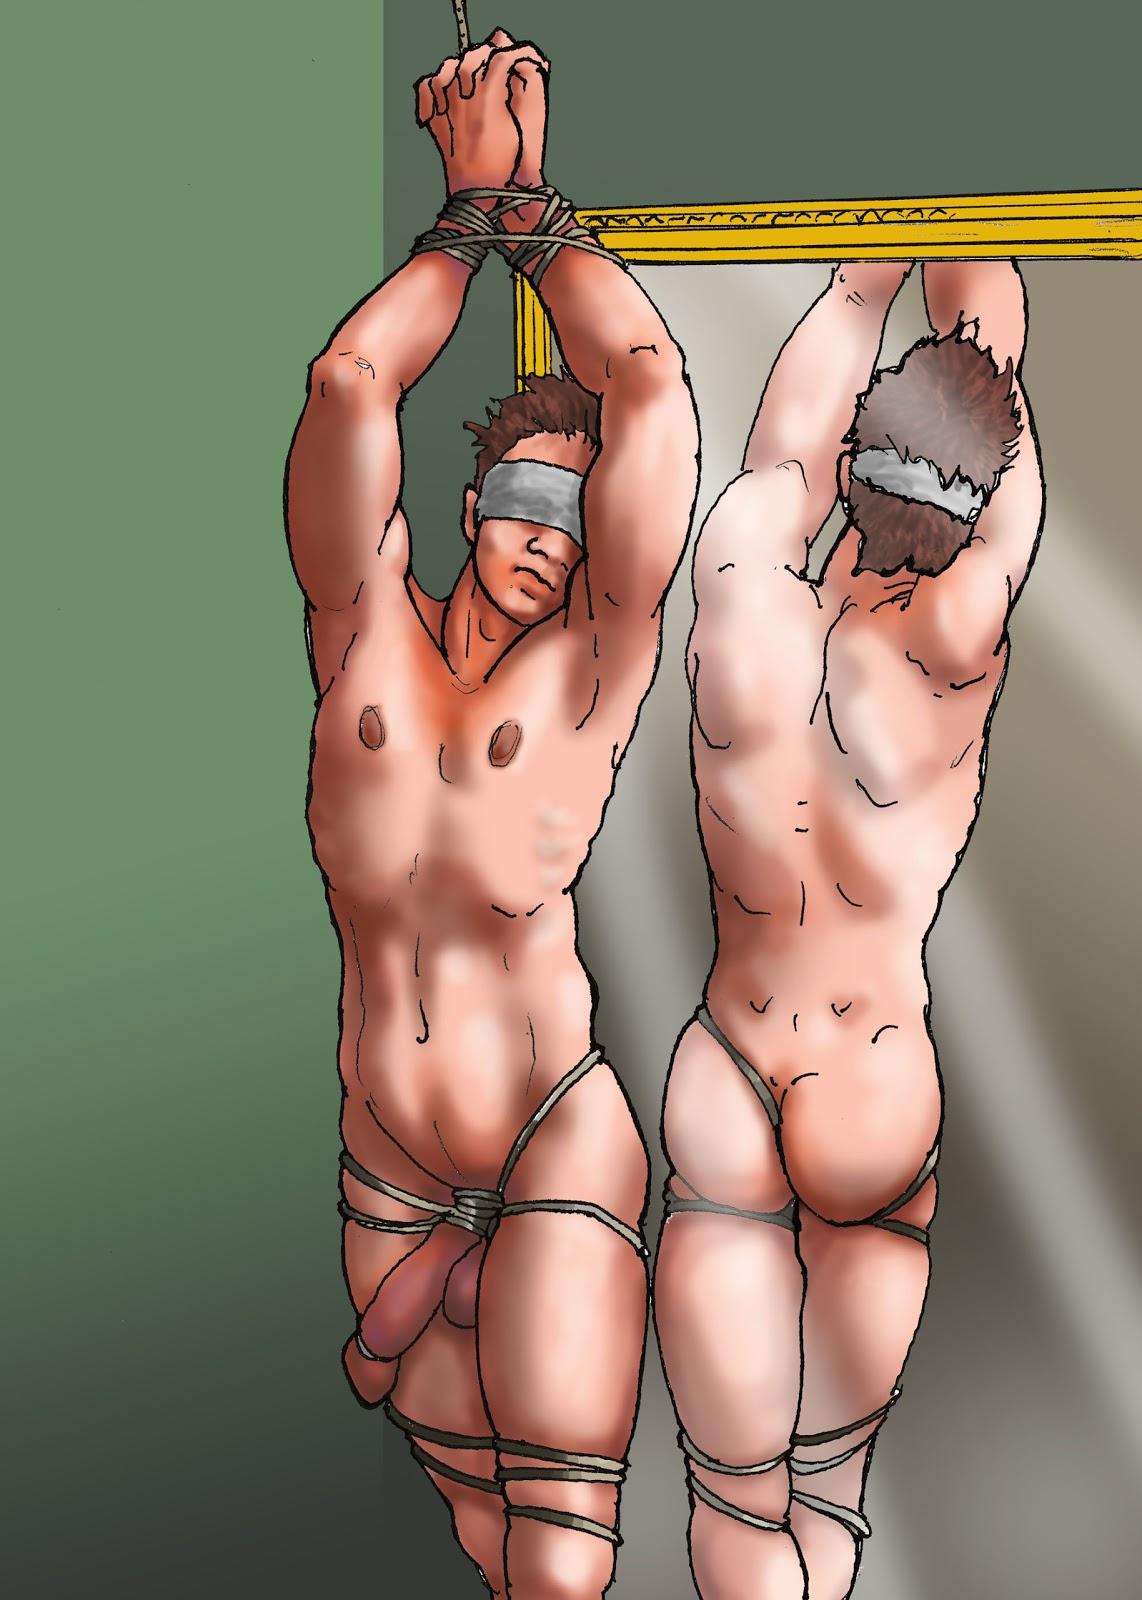 BDSM Male Drawings